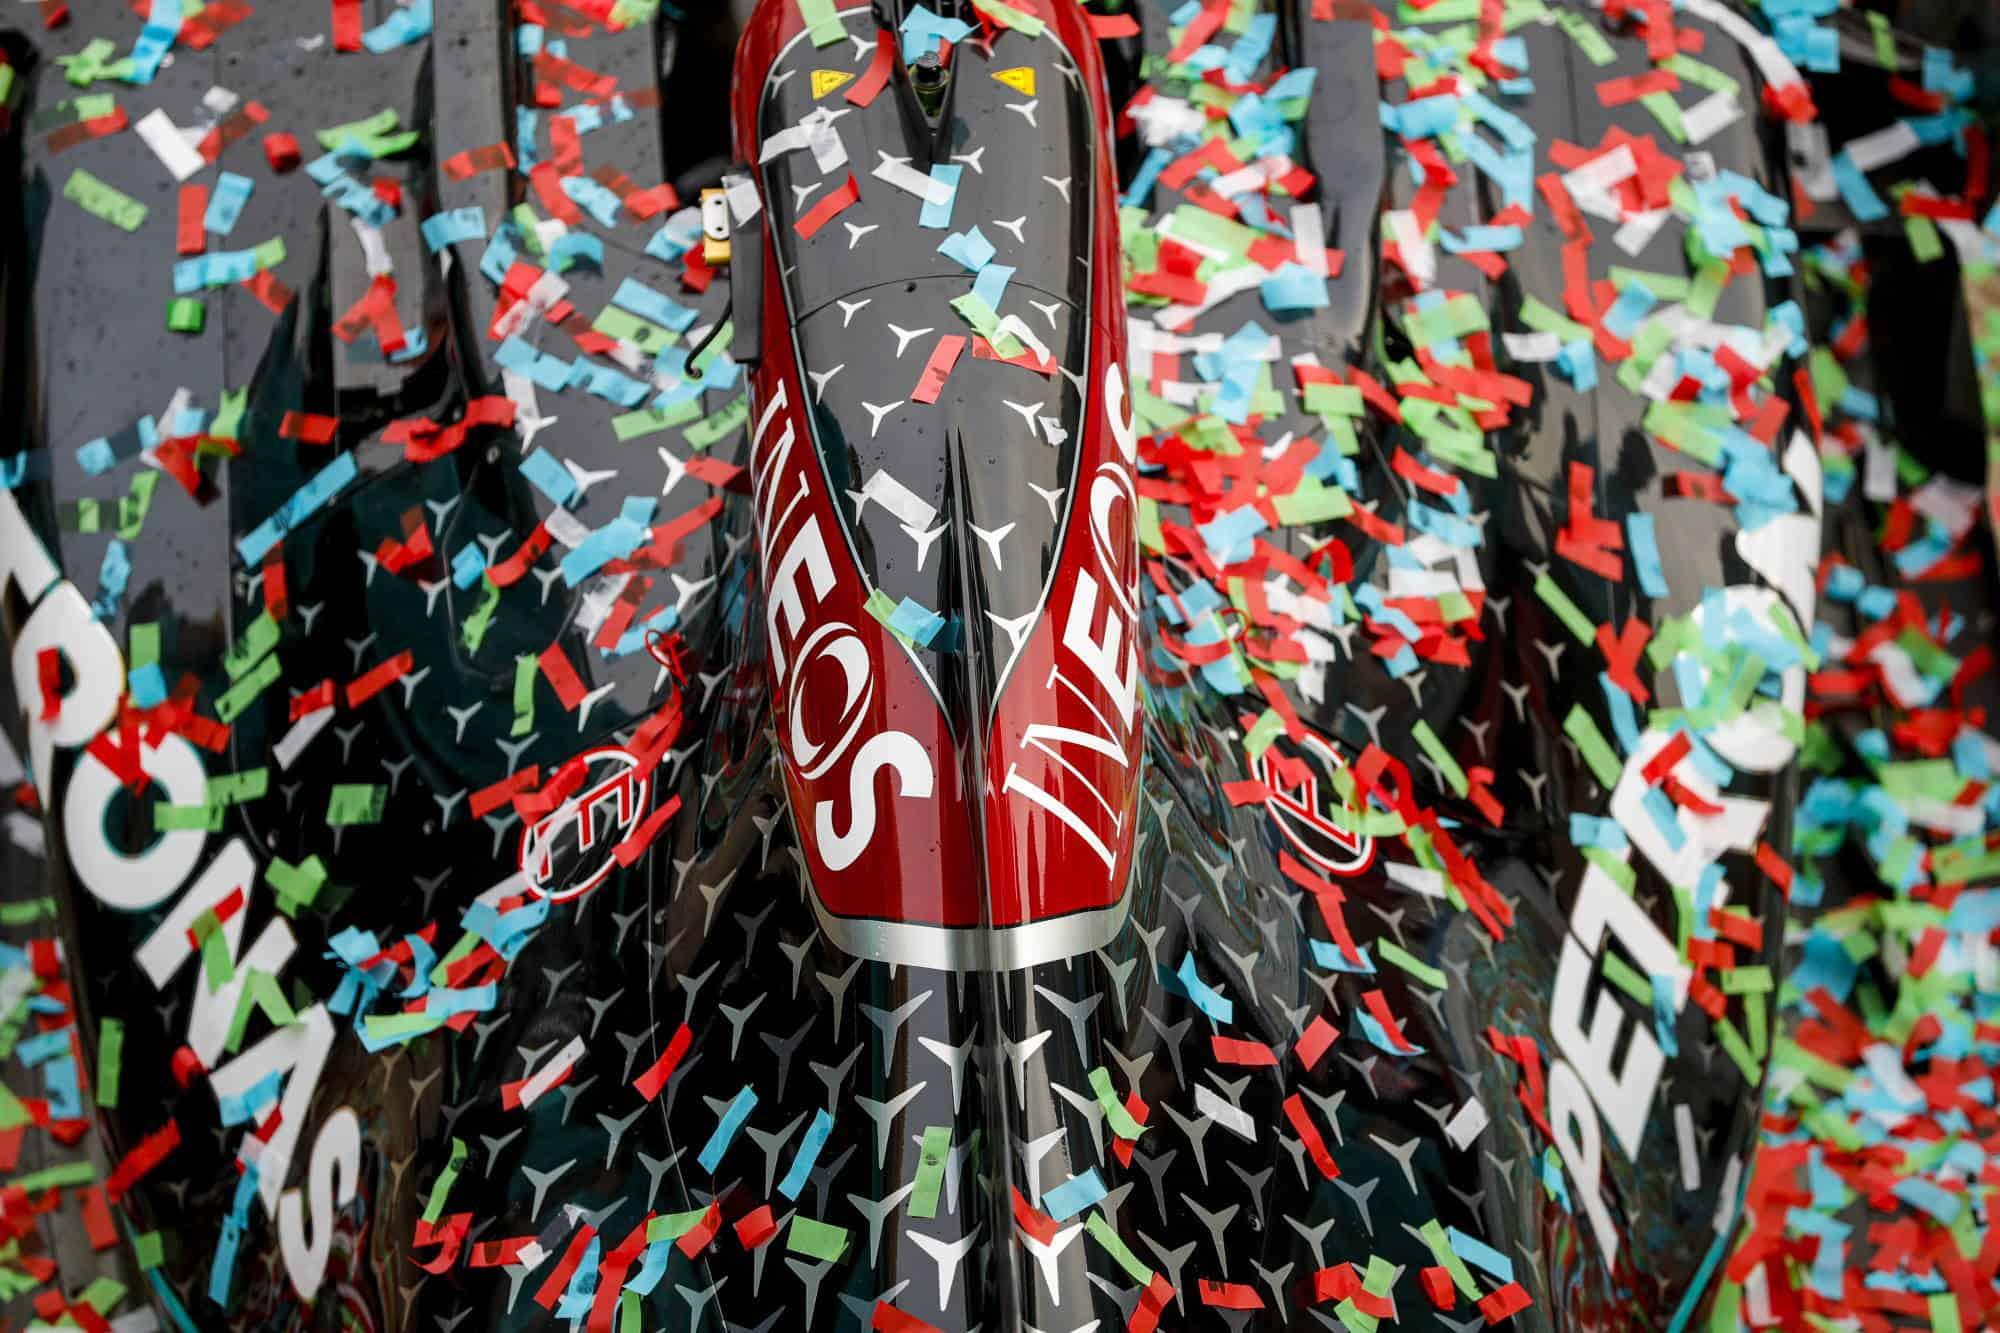 2020 Emilia Romagna Imola Mercedes celebrate 1-2 and 7th constructors title confetti on the car Photo Daimler